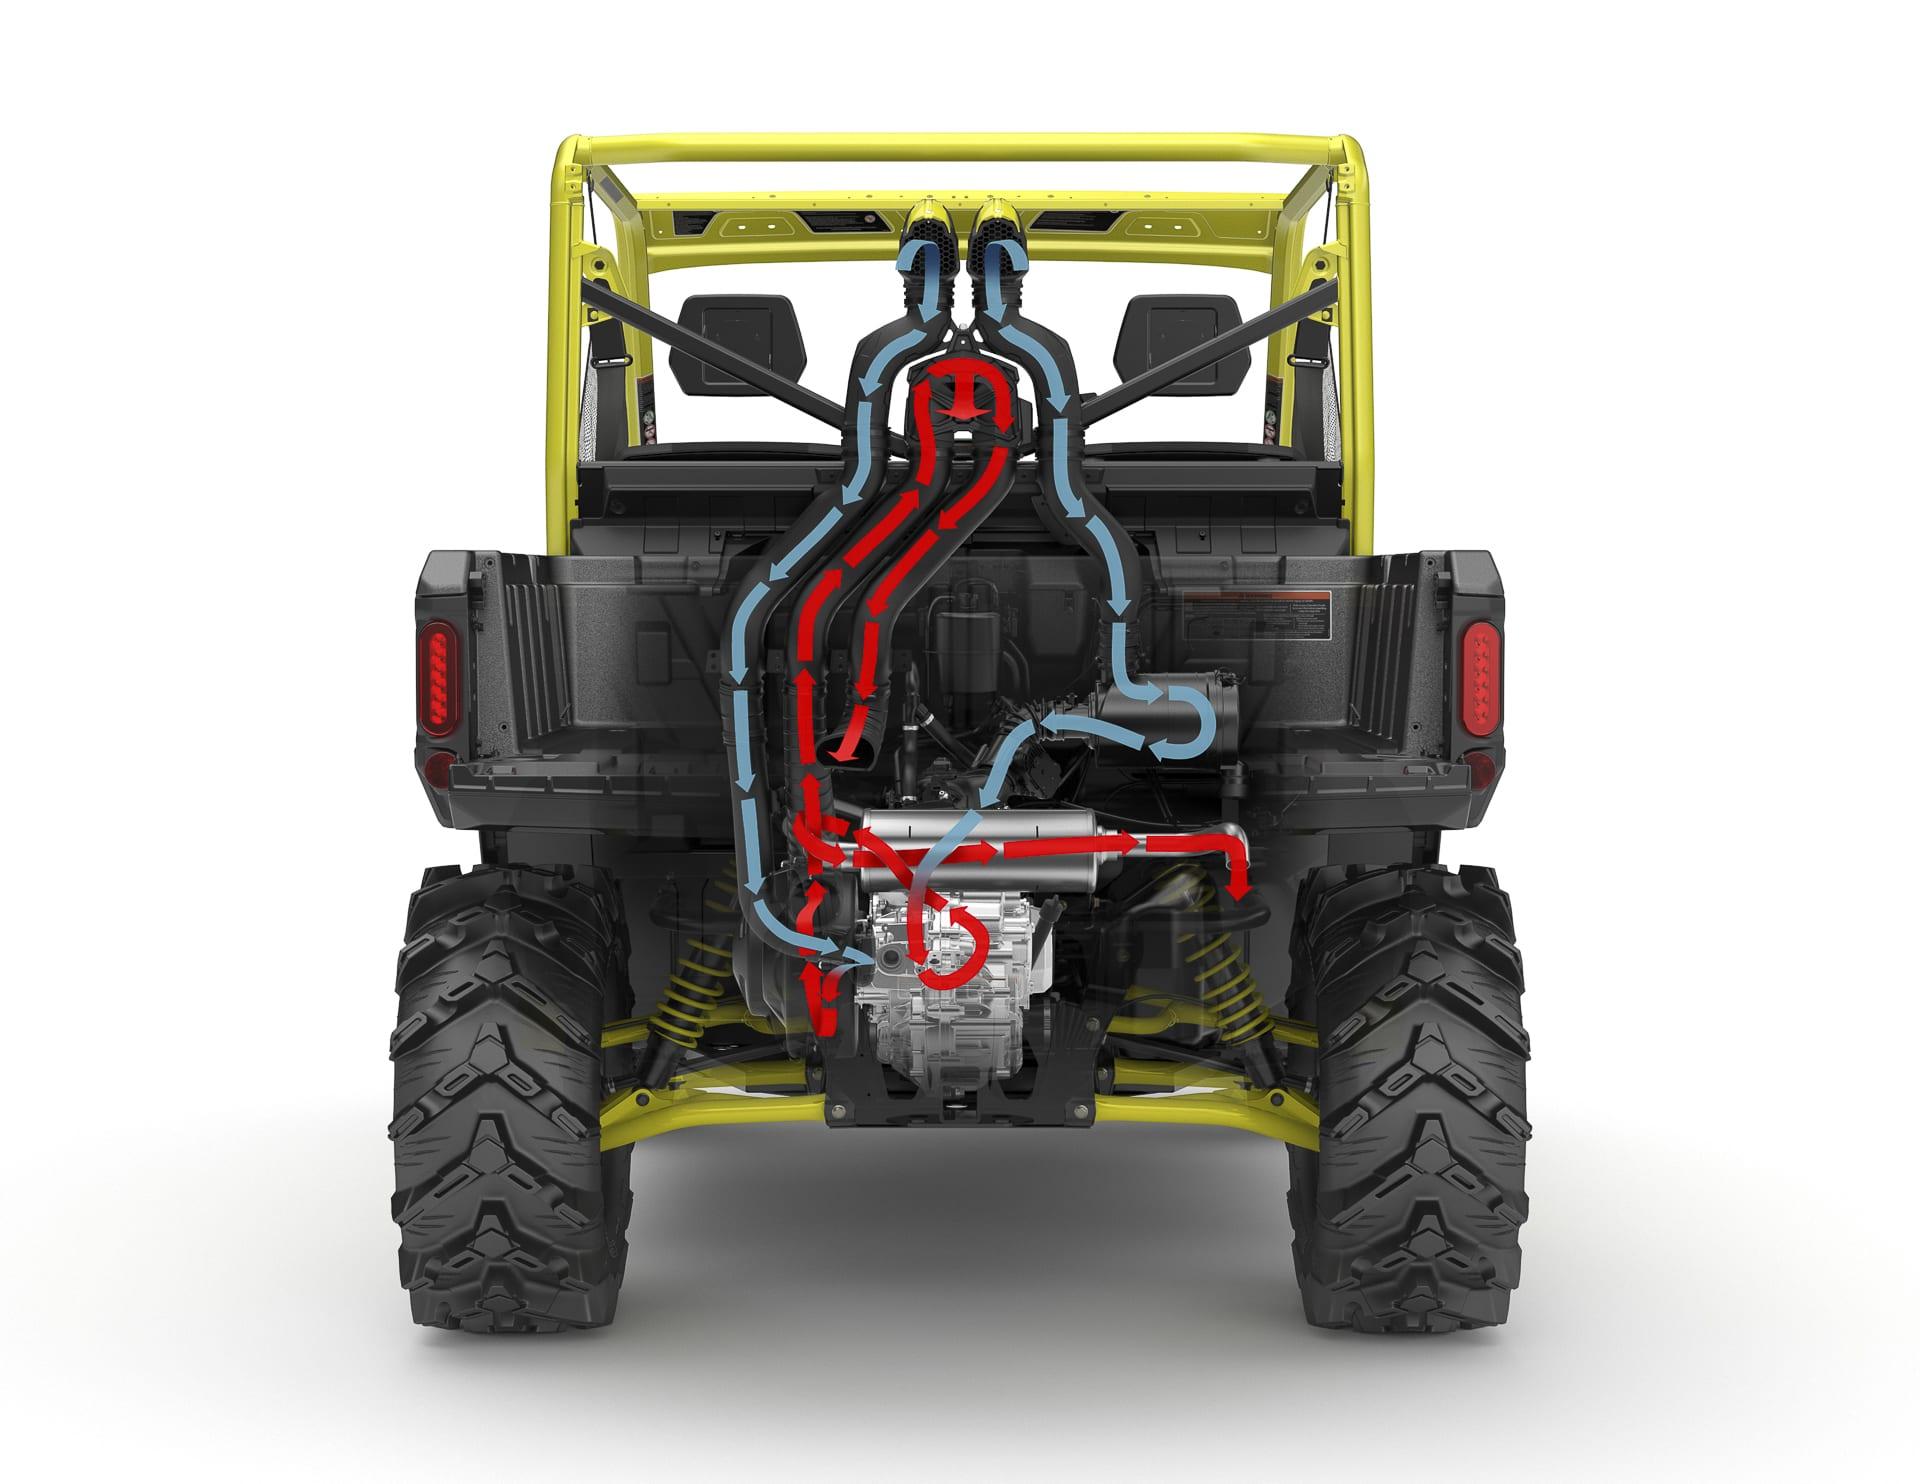 2018 Can-Am Defender X MR Lineup | ATV Trail Rider Magazine